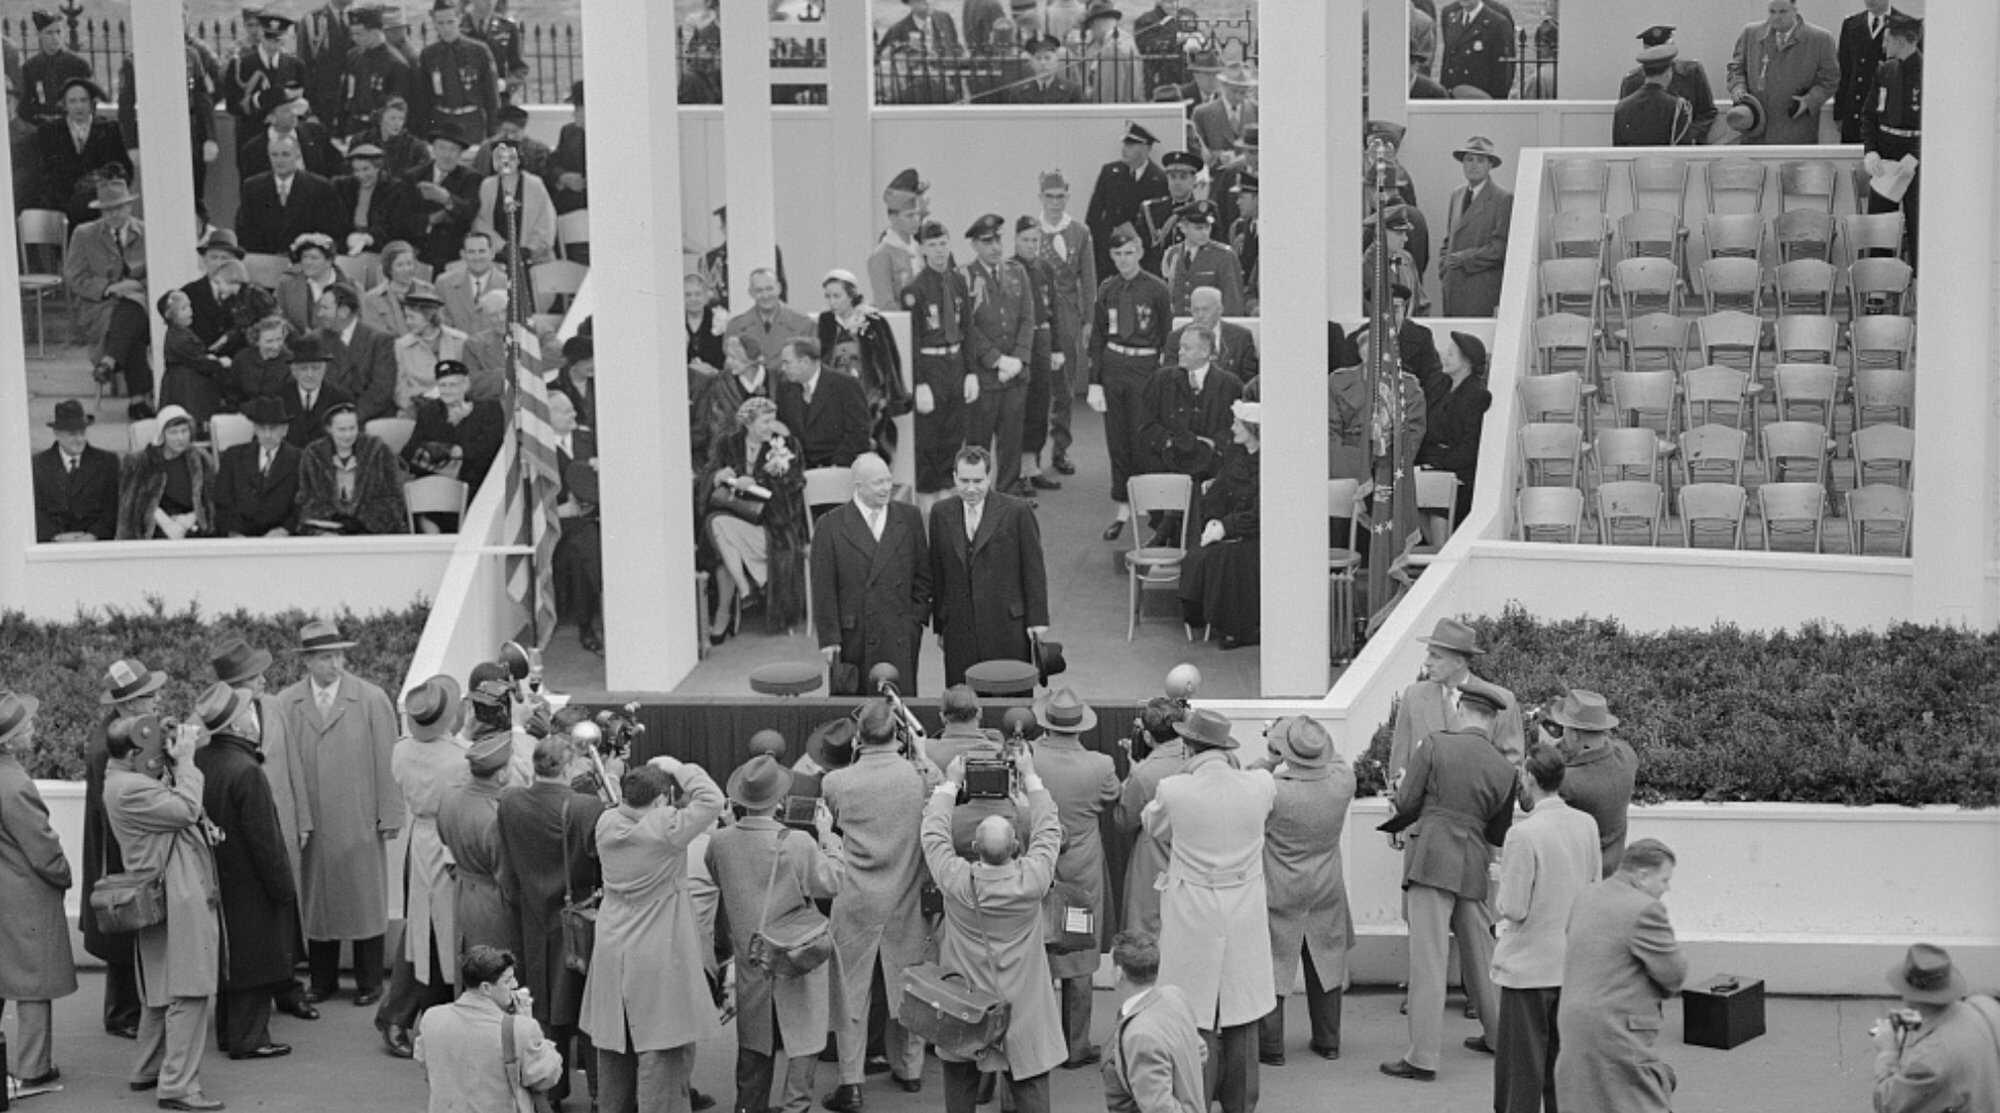 Eisenhower Inaug address 1953 LOC.jpg